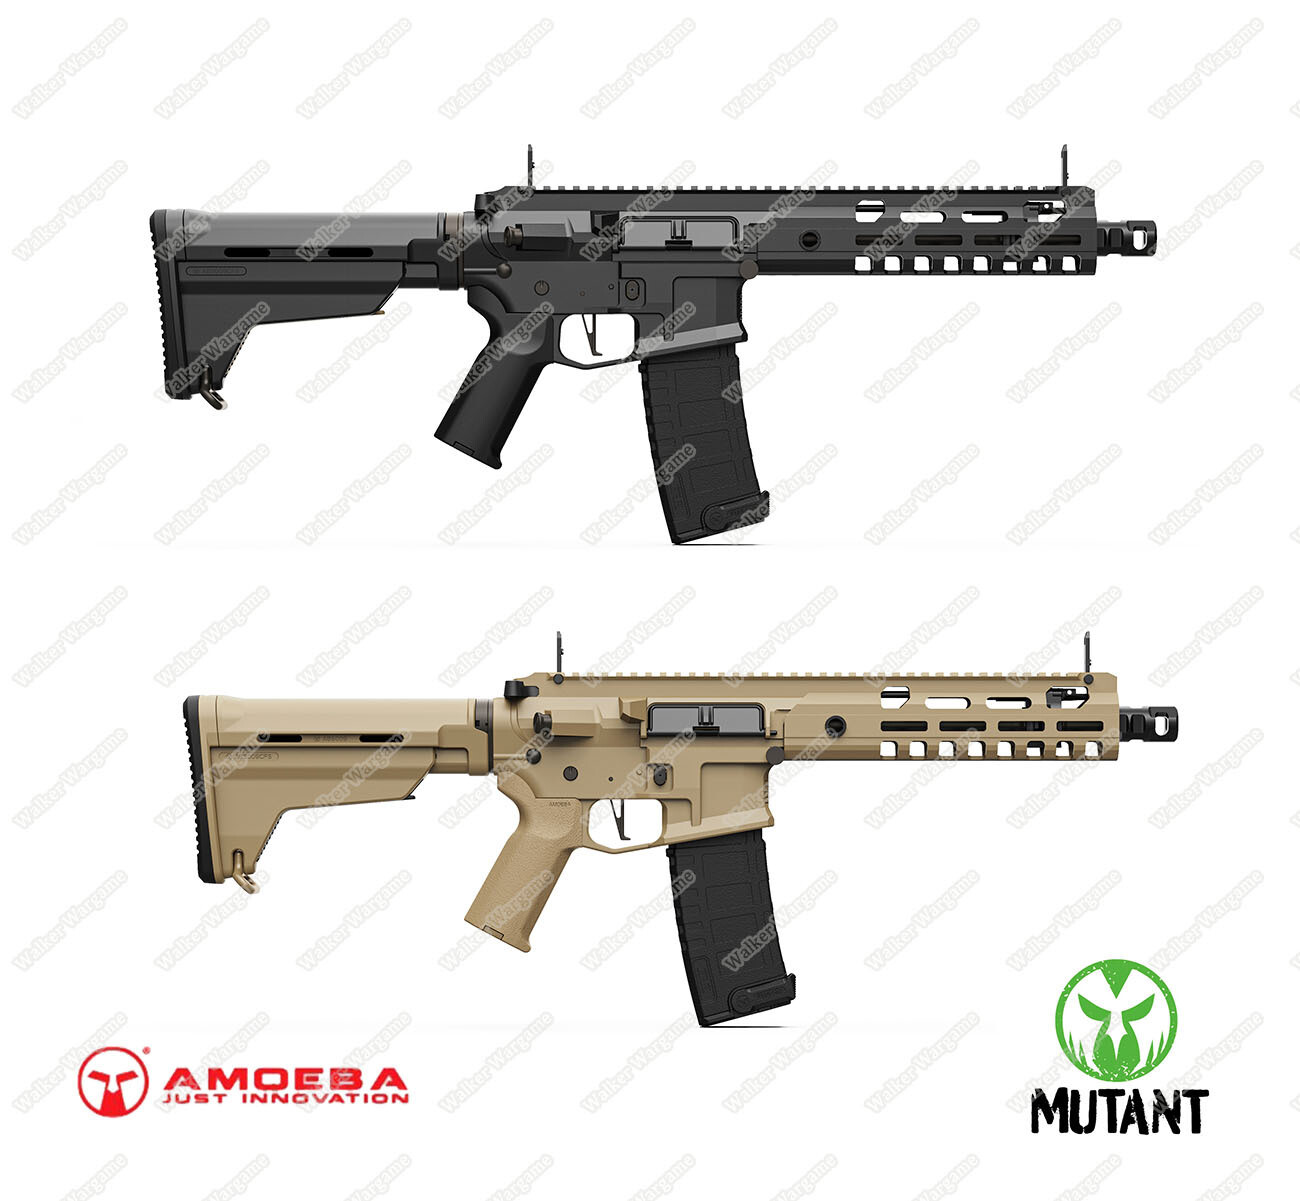 ARES Amoeba MIT AMM9 Mutant Series - AEG With E.F.C.S.